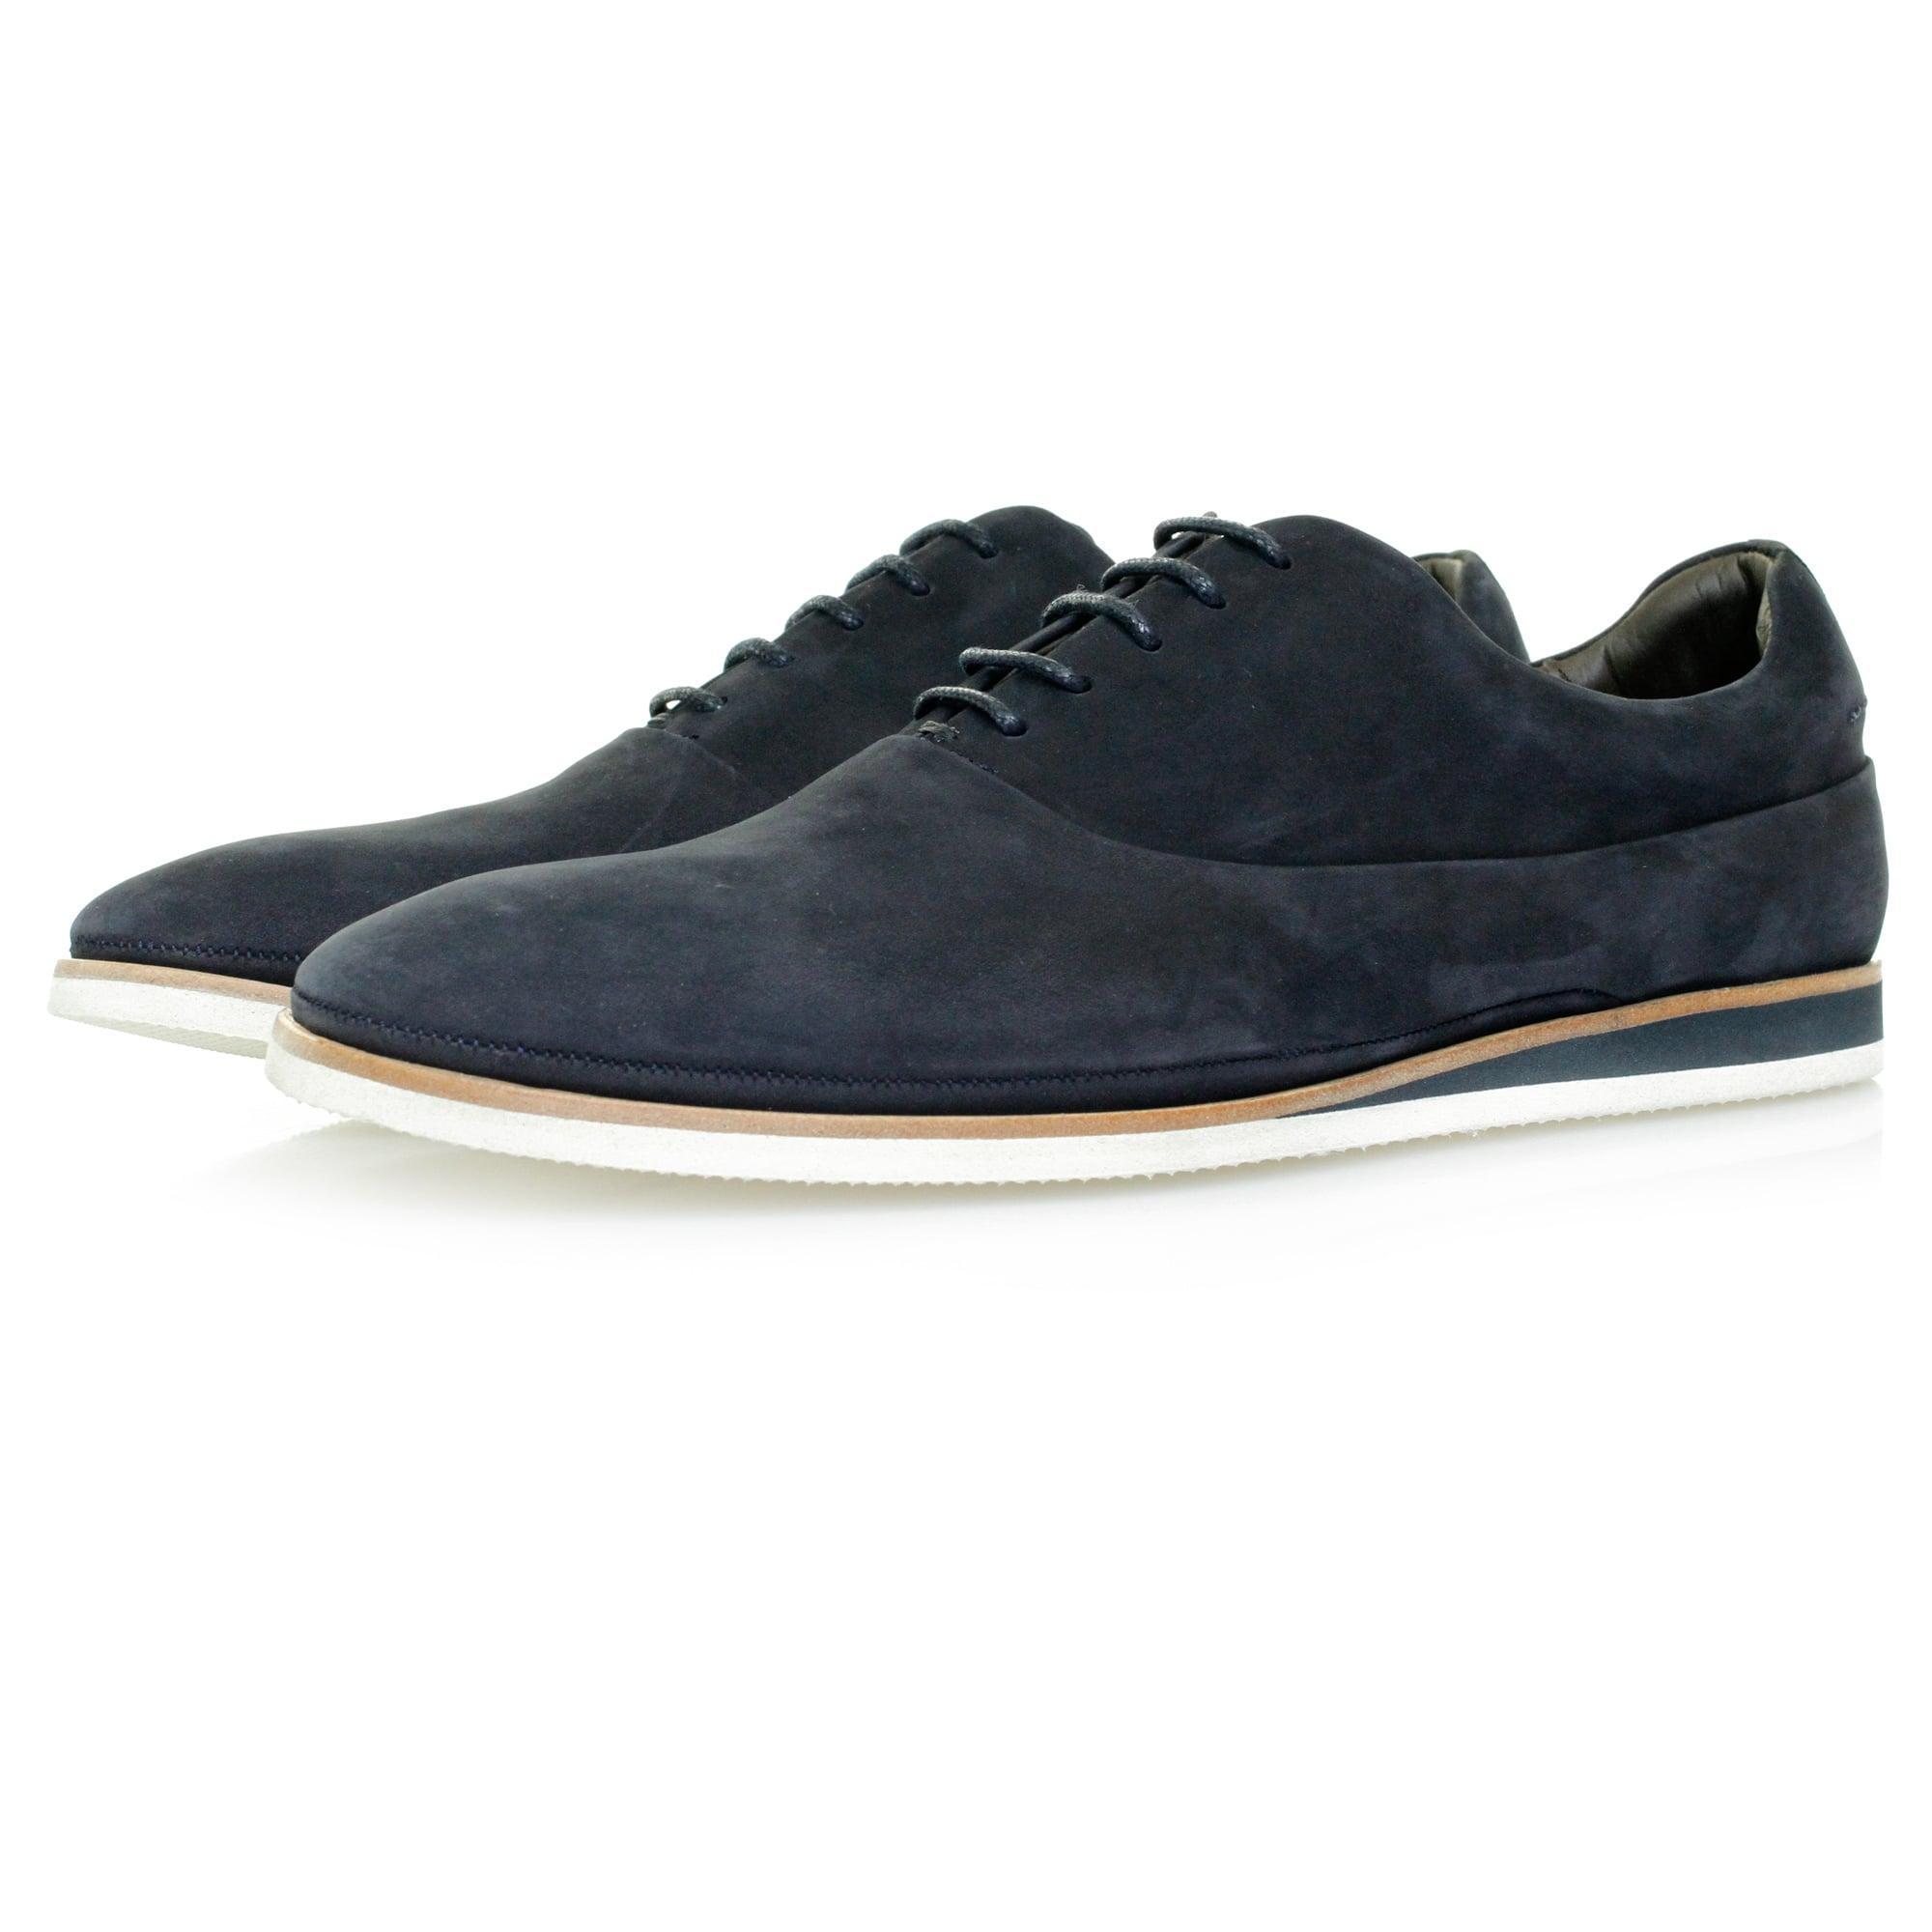 Hugo Boss Eclectic Oxford Navy Shoe 50330576